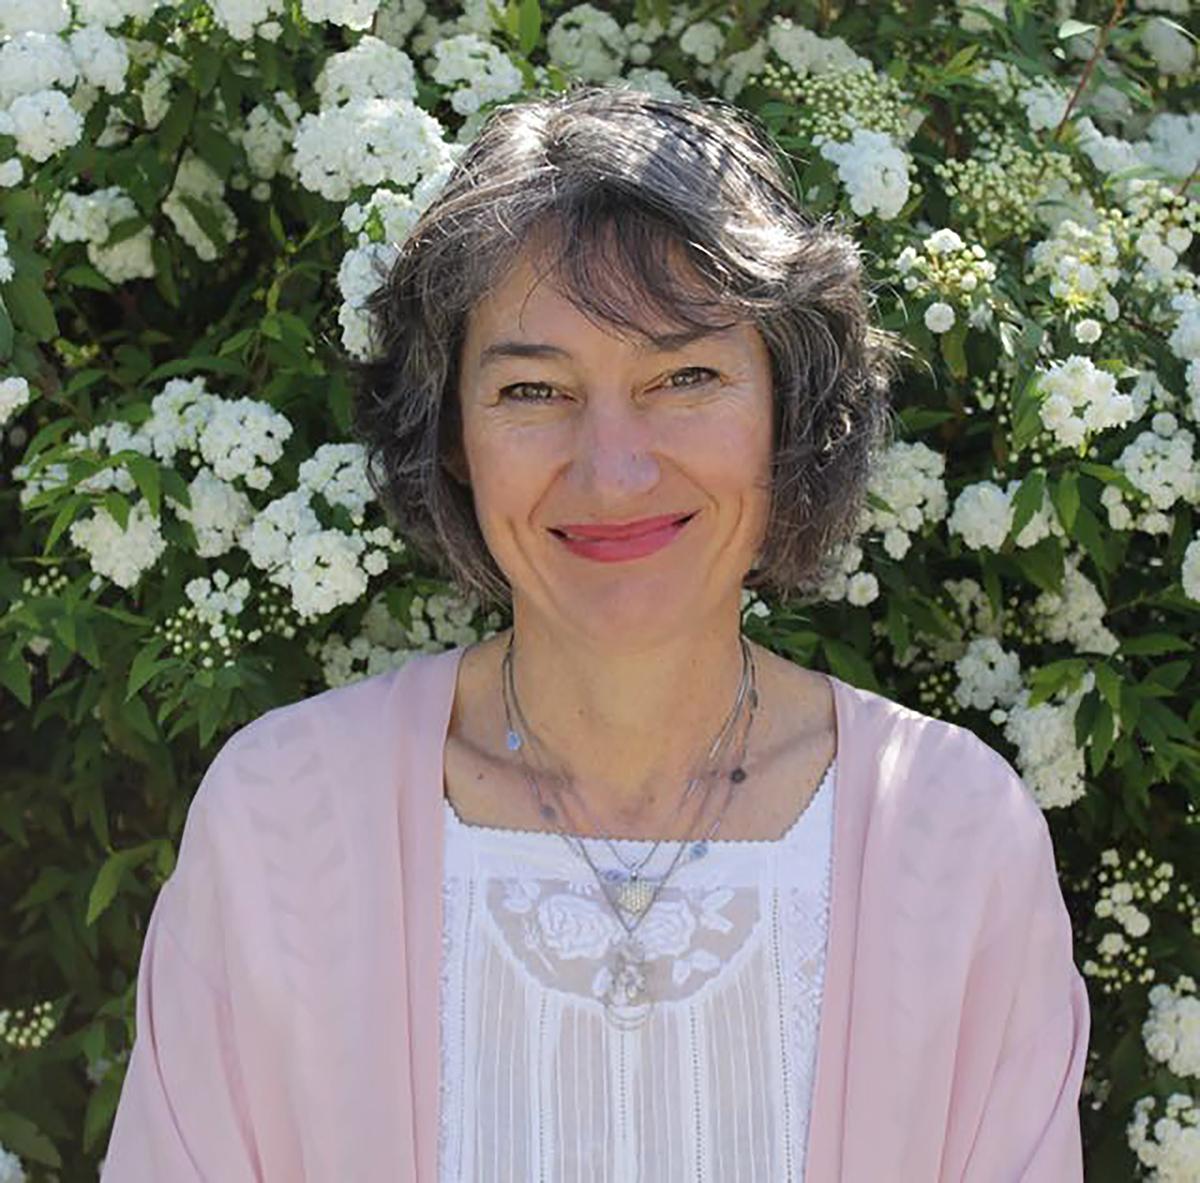 Catherine Holt